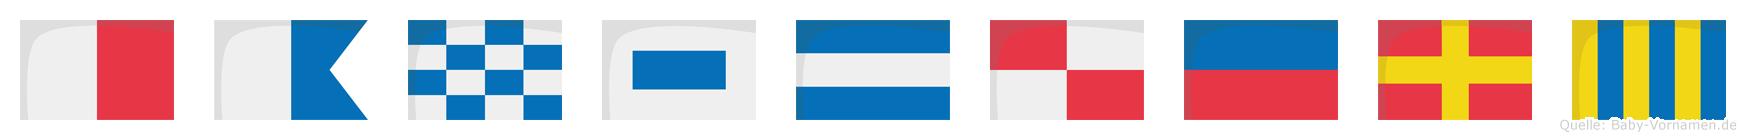 Hansjürg im Flaggenalphabet